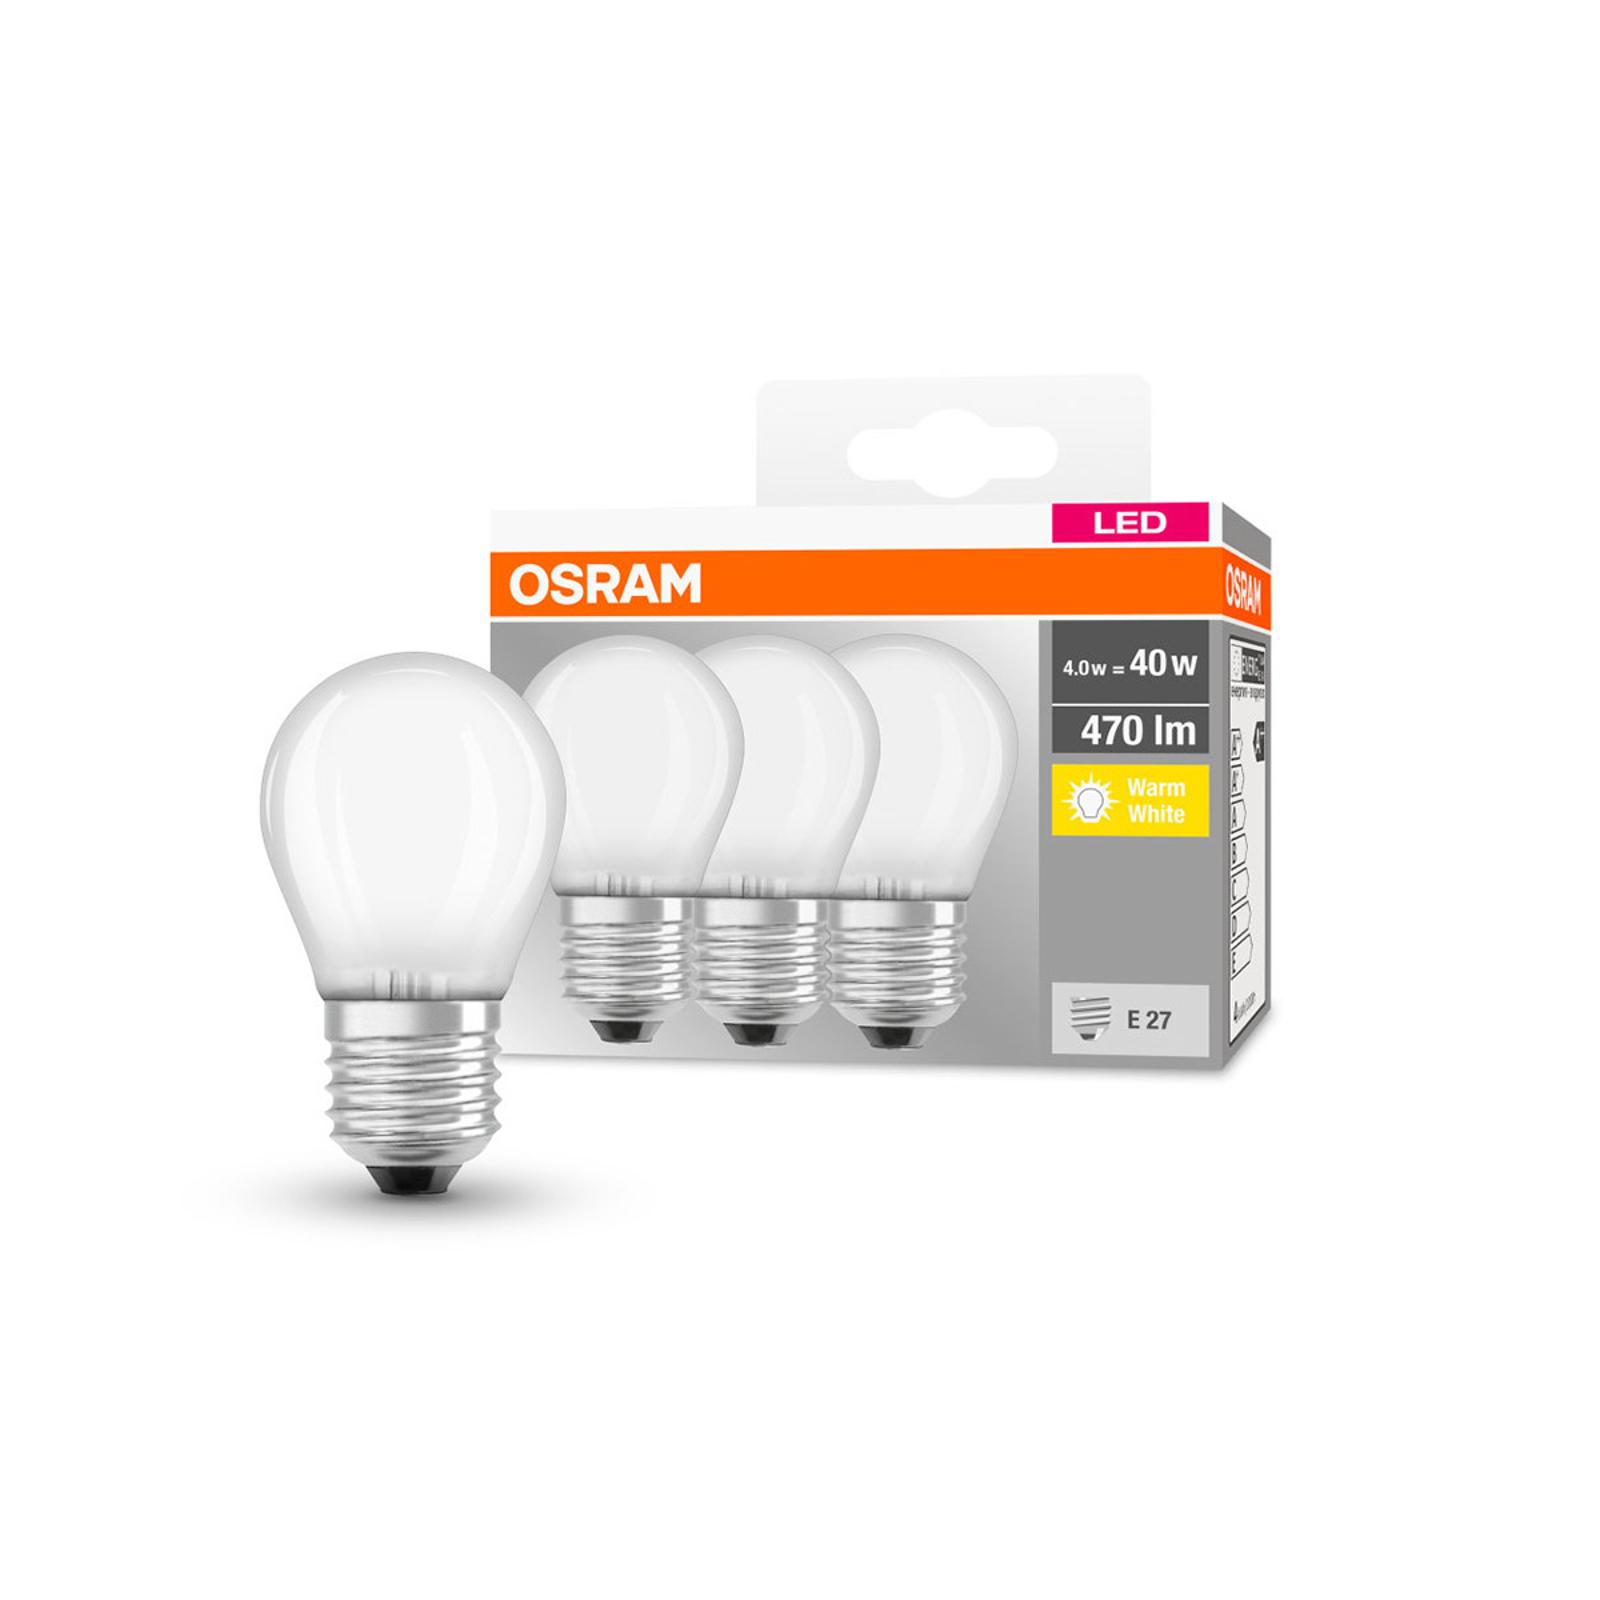 OSRAM kropla LED E27 P40 4W 470lm matowa 3 szt.